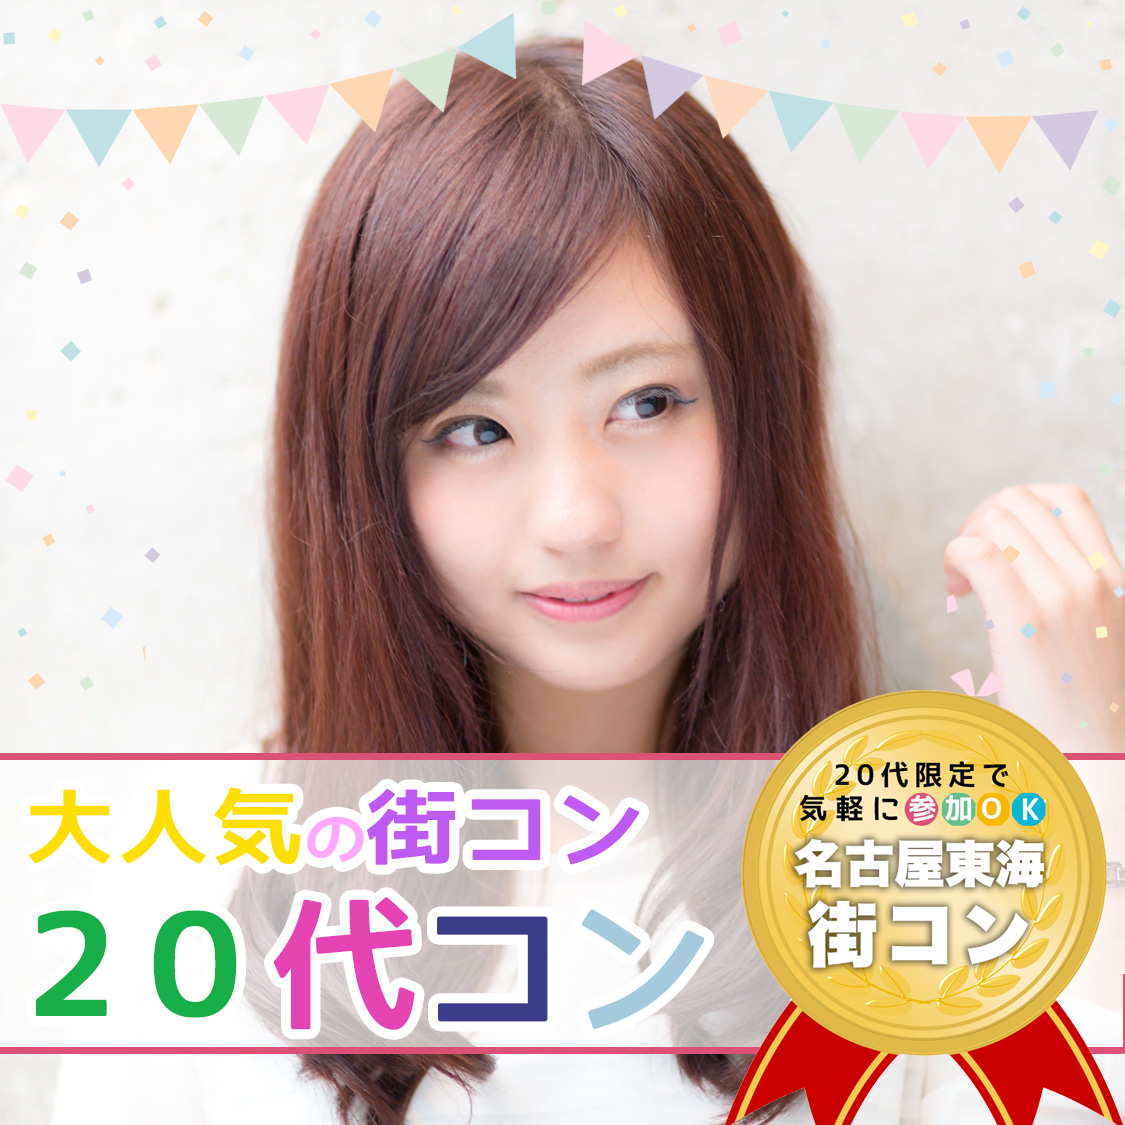 街コン,若い,四季彩 仙台駅前店,仙台